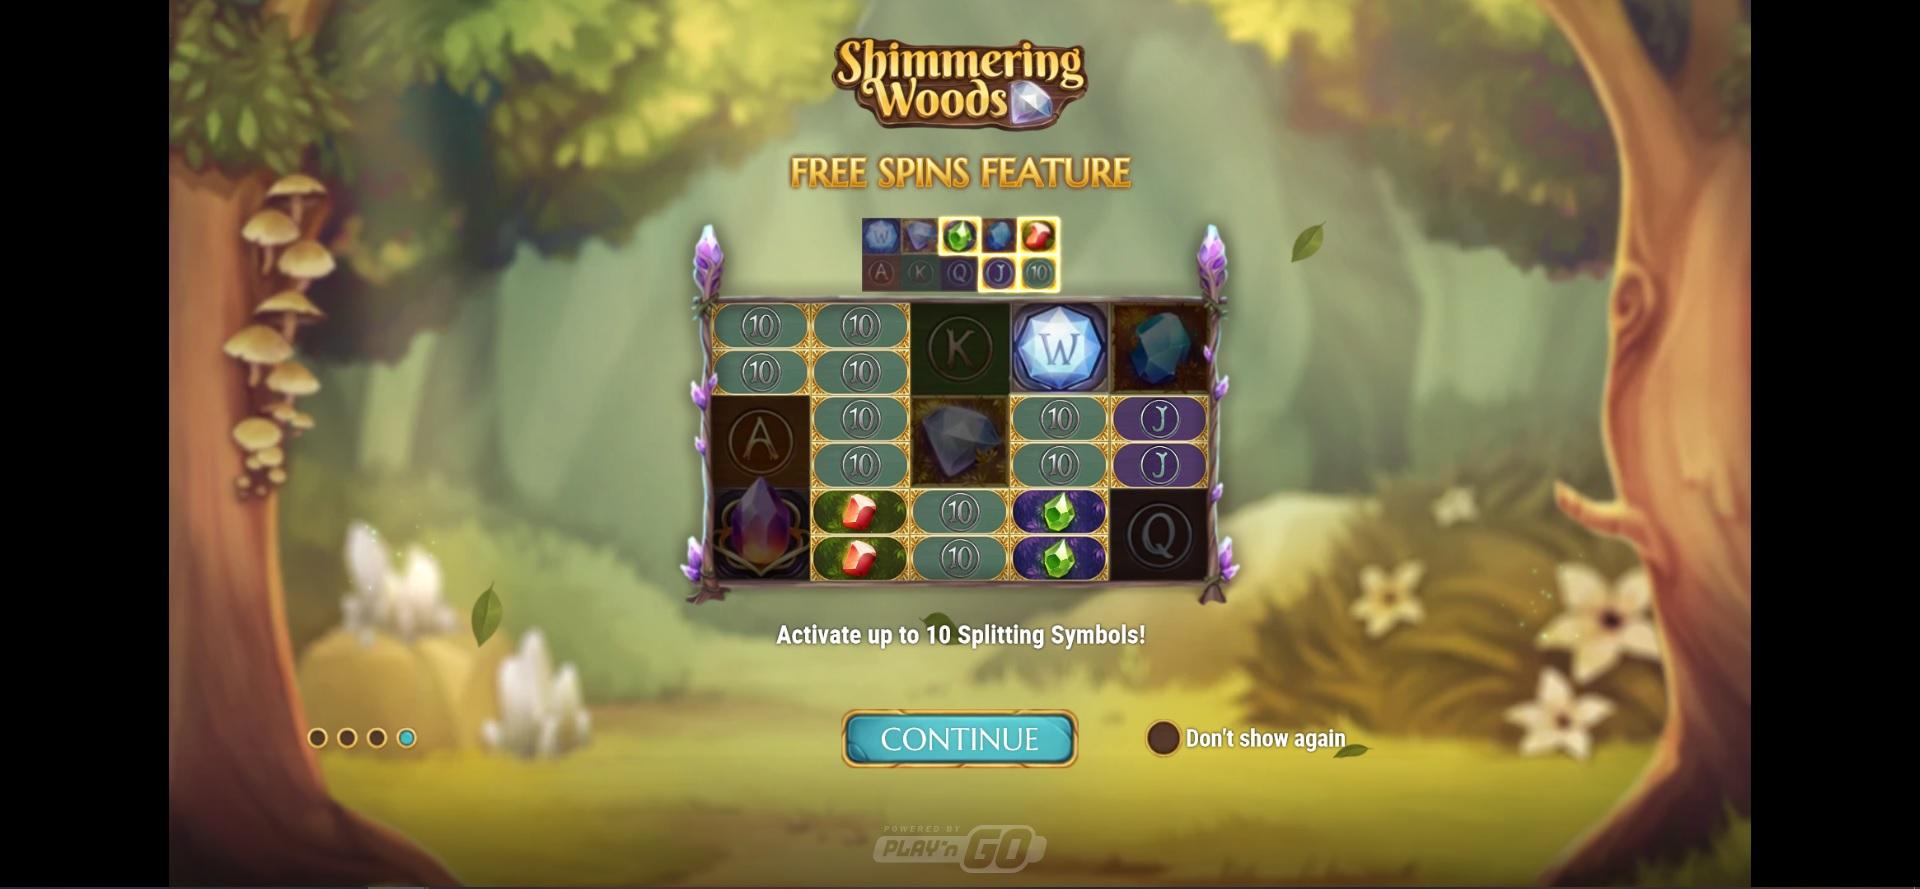 How to win big in Shimmering Woods – Splitting Symbols